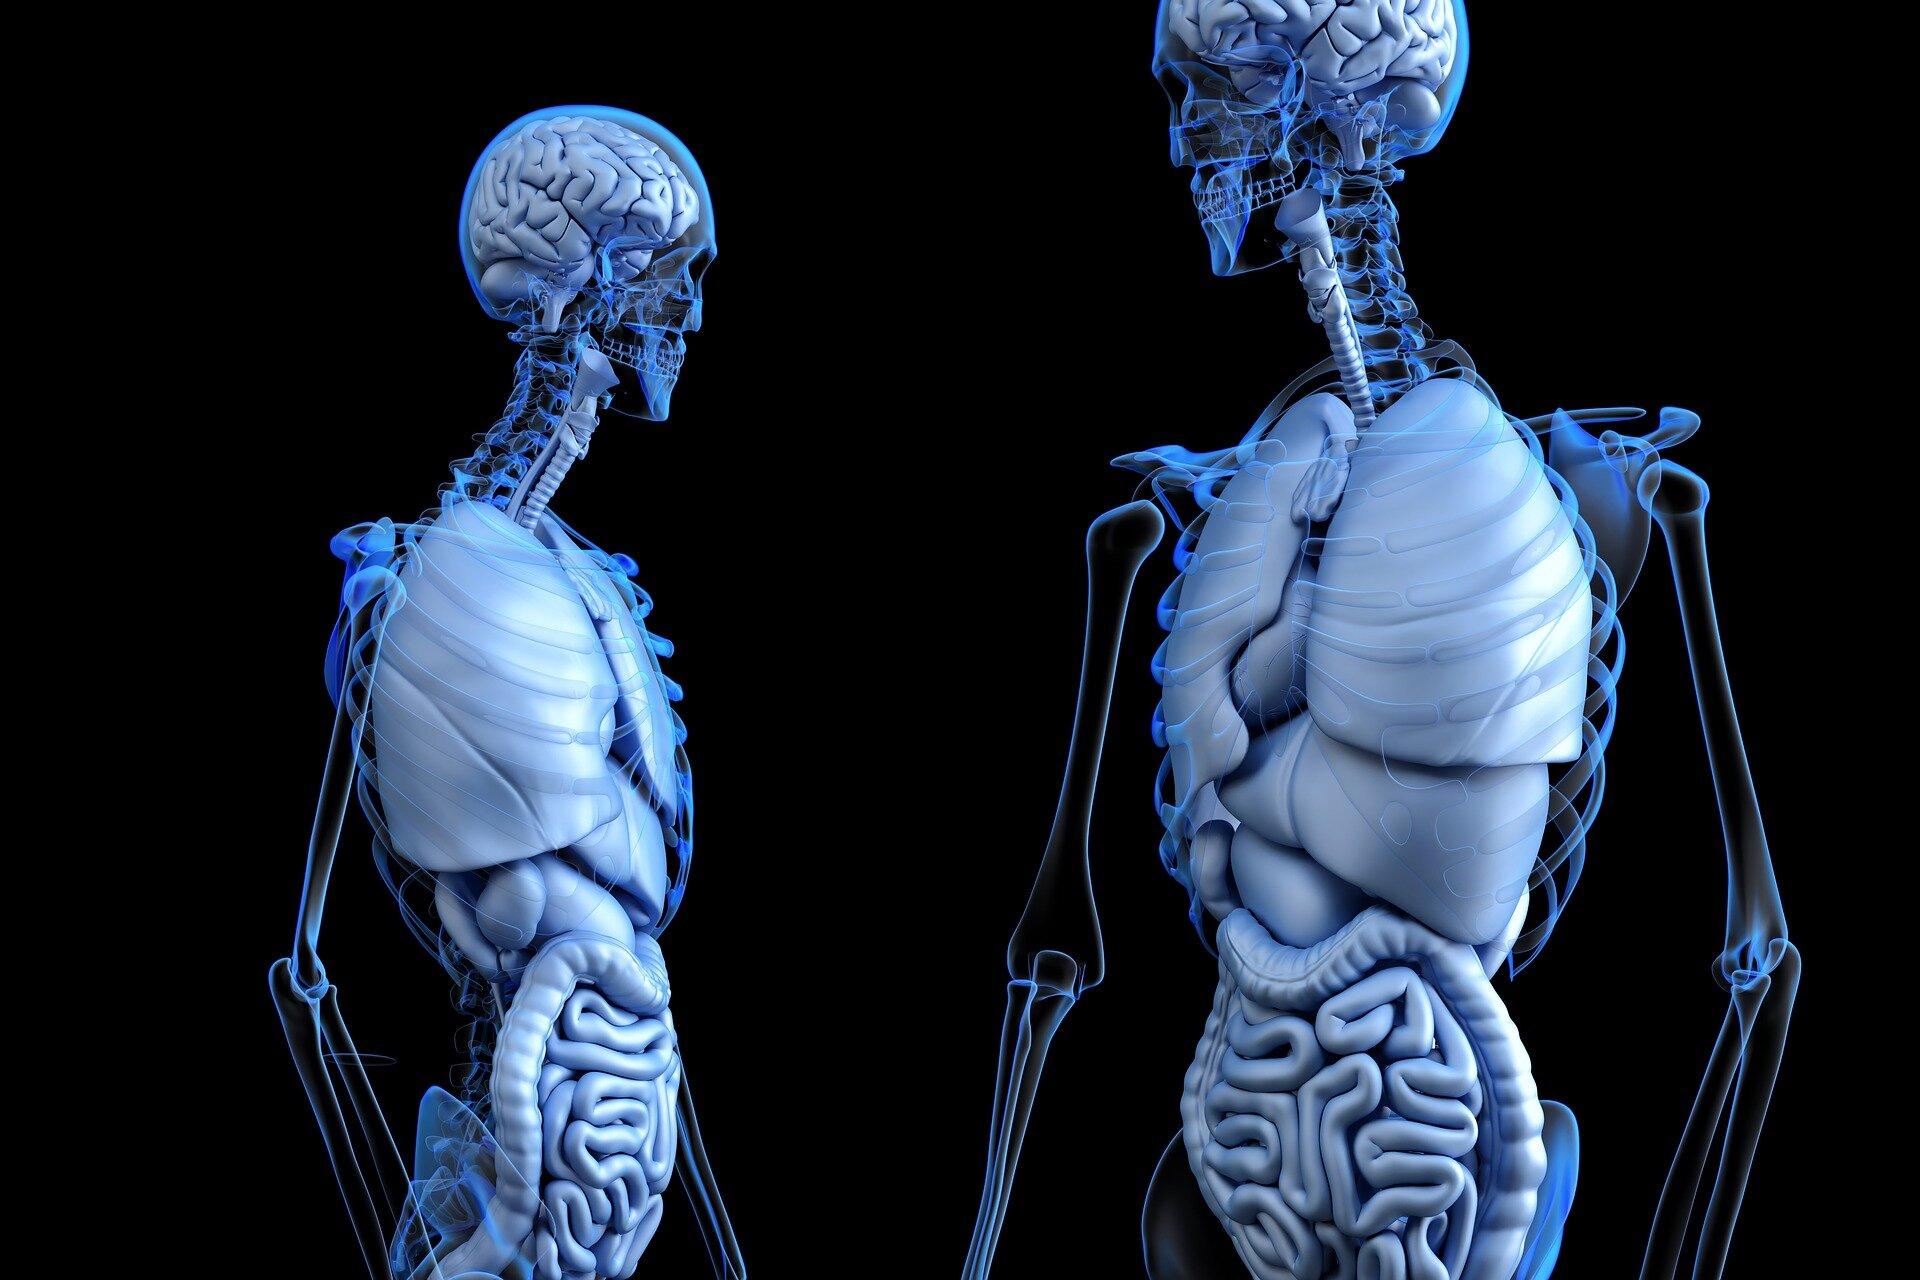 Stronger bones thanks to heat and microbiota